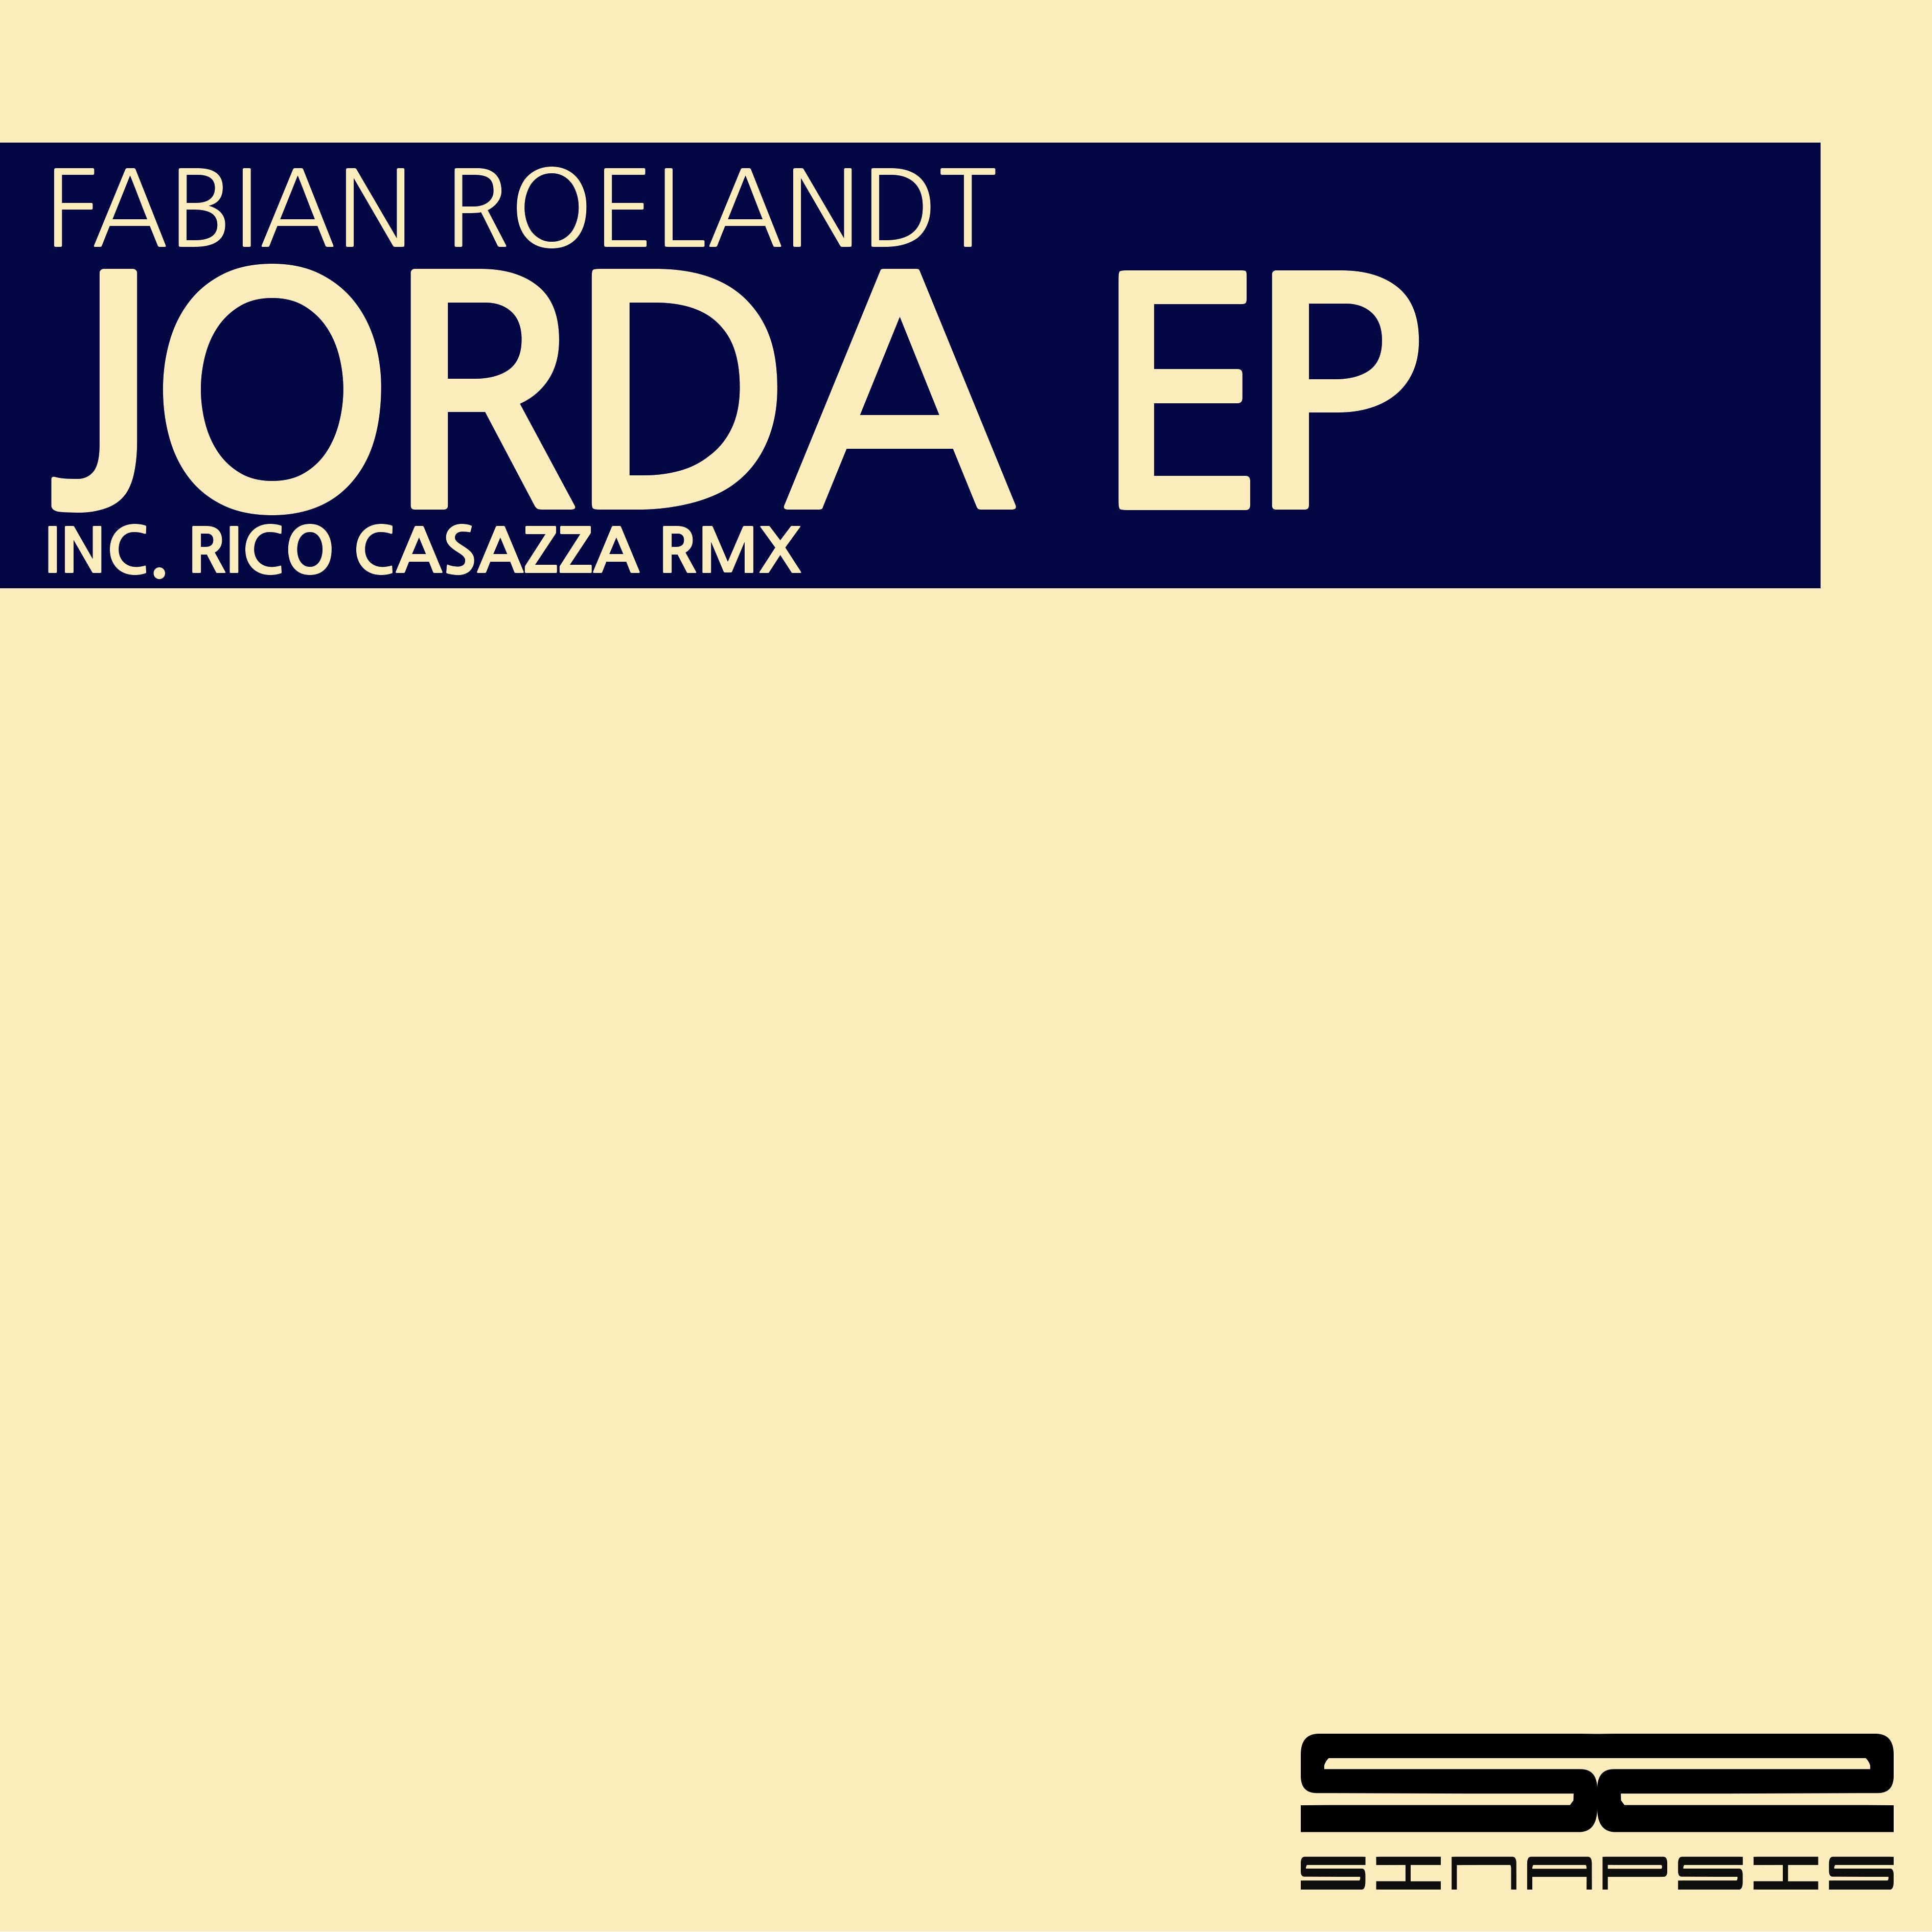 FABIAN ROELANDT FIRMA 'JORDA EP' EN SINAPSIS MUSIC COVER SPS002